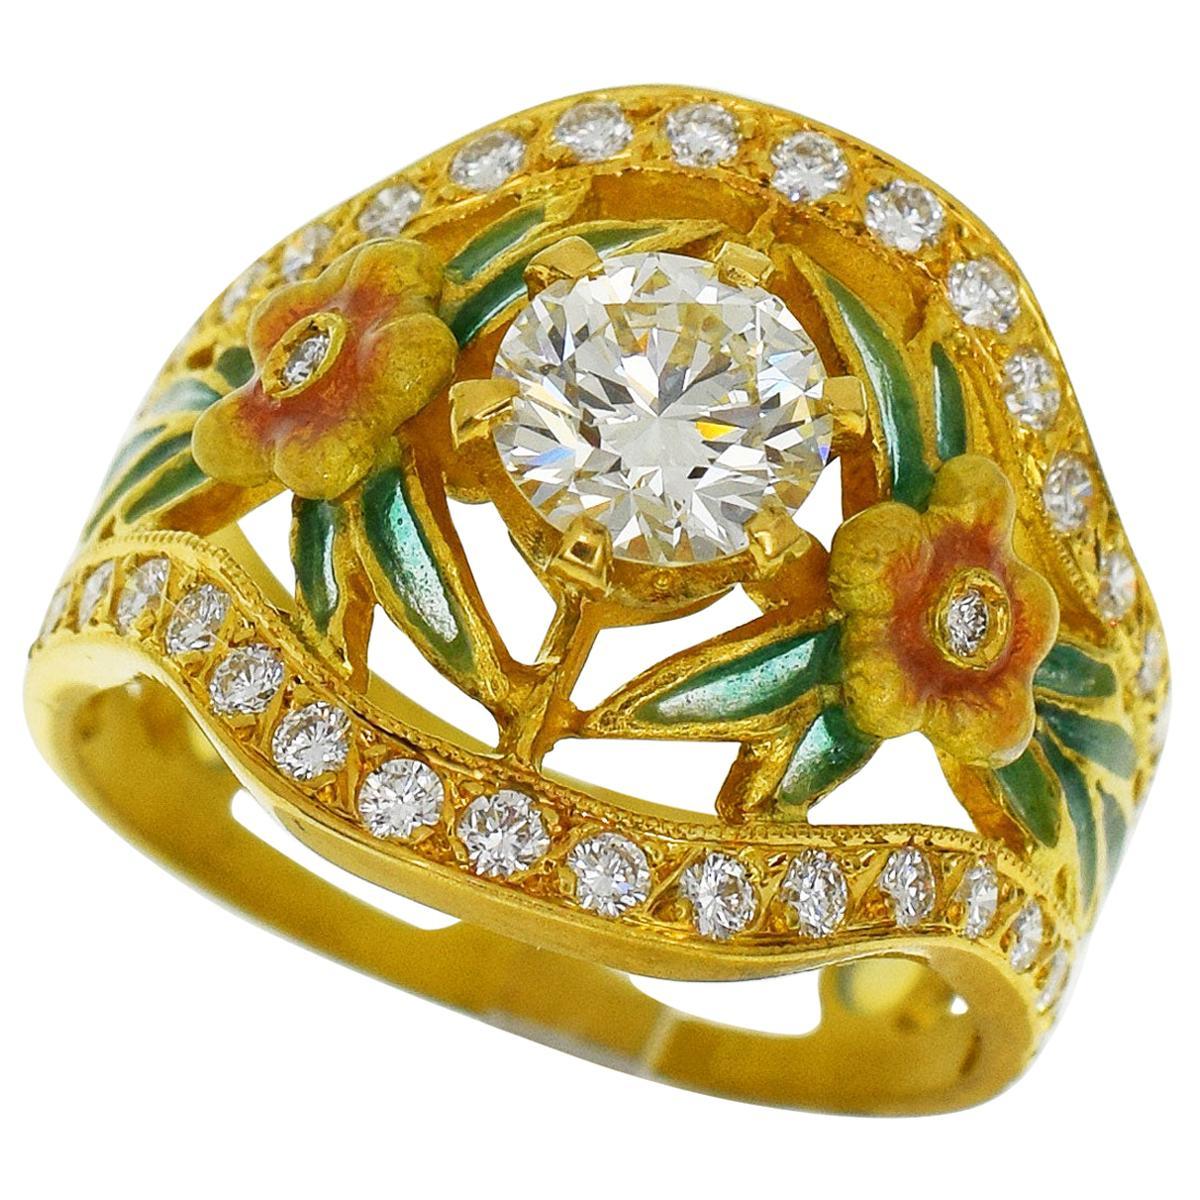 Masriera 18 Karat Yellow Gold Diamond Enamel Ring US 6